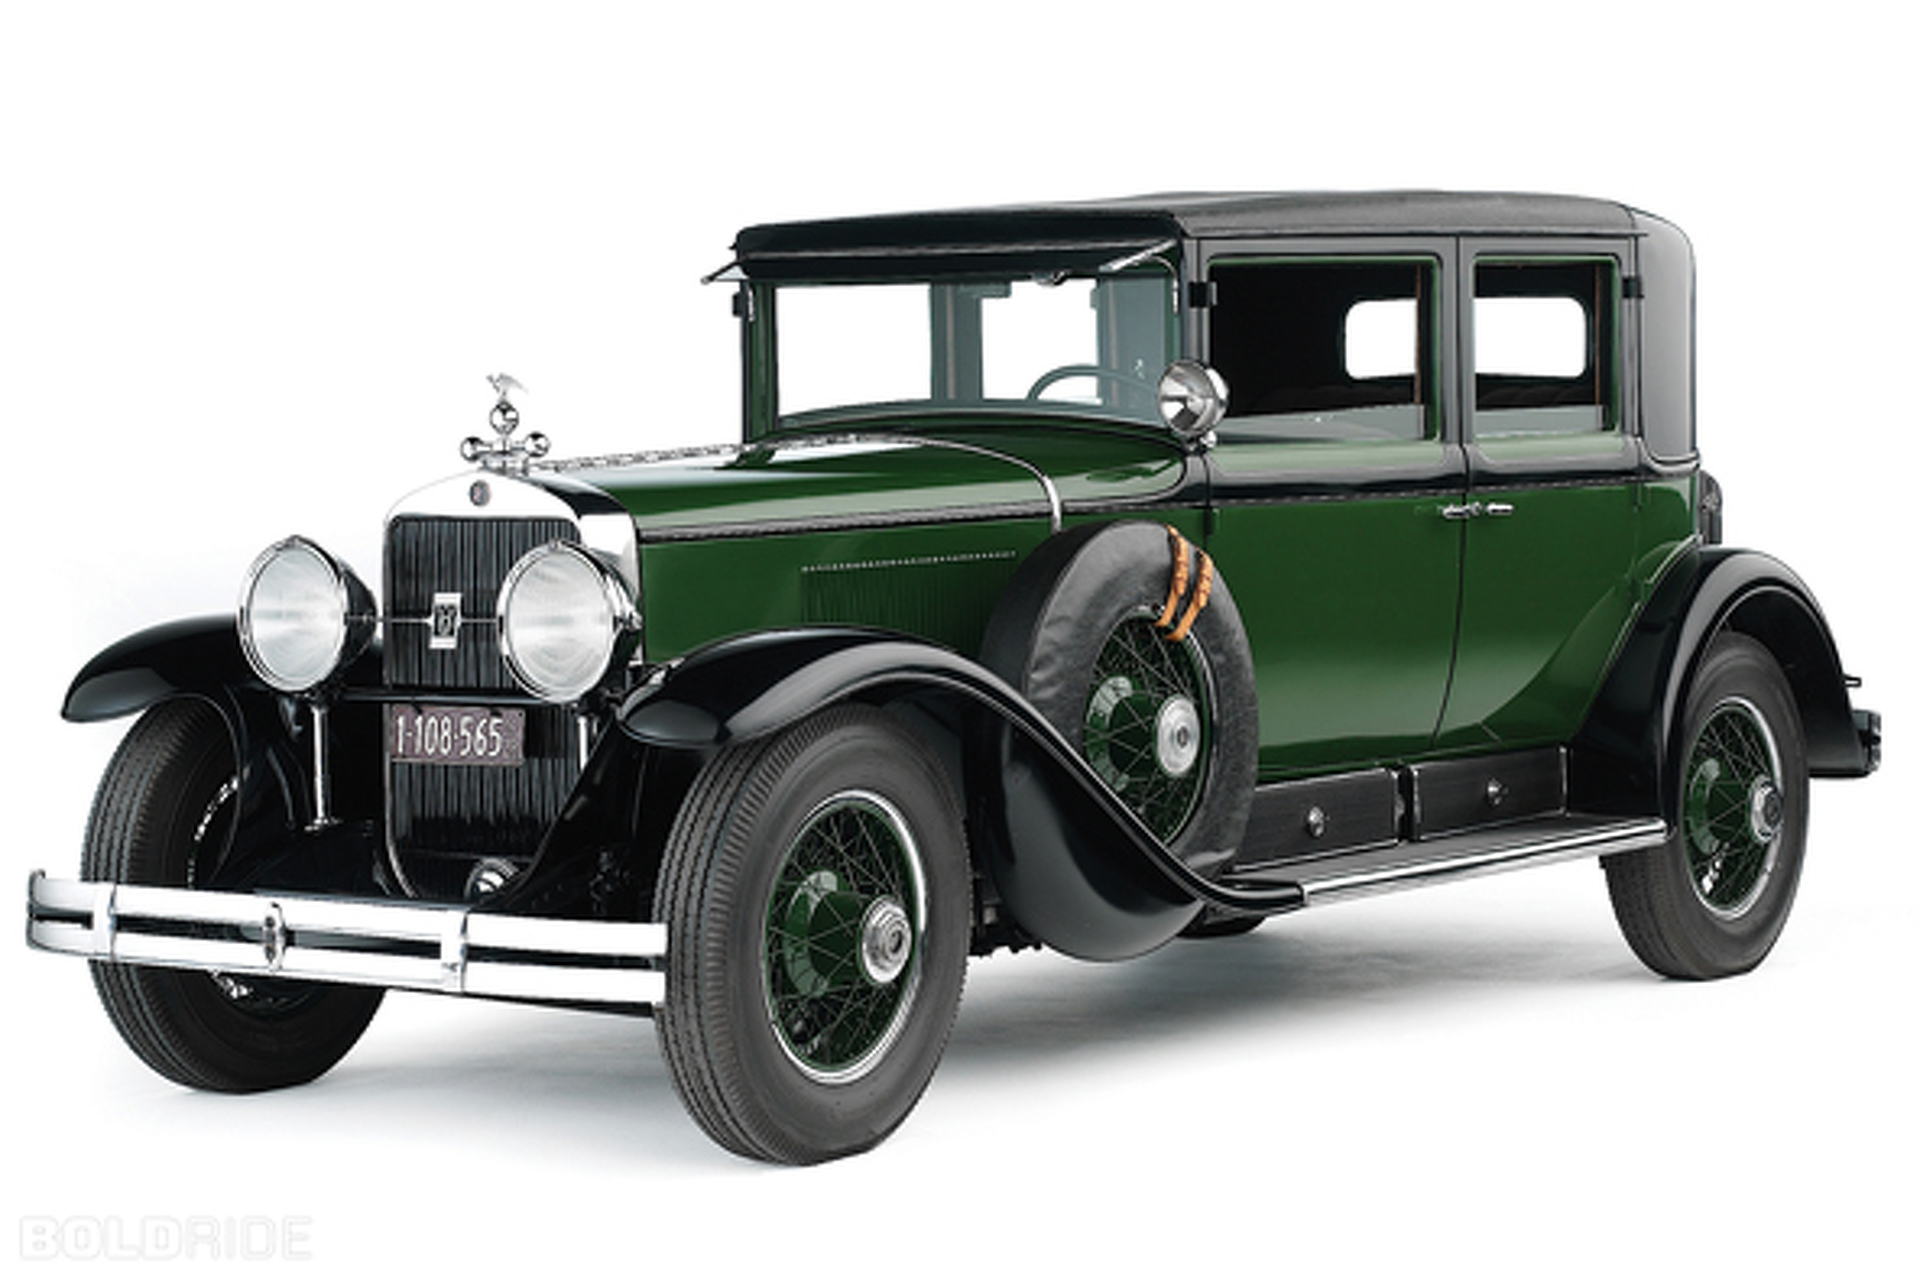 Most Popular: 1928 Cadillac Al Capone Town Sedan